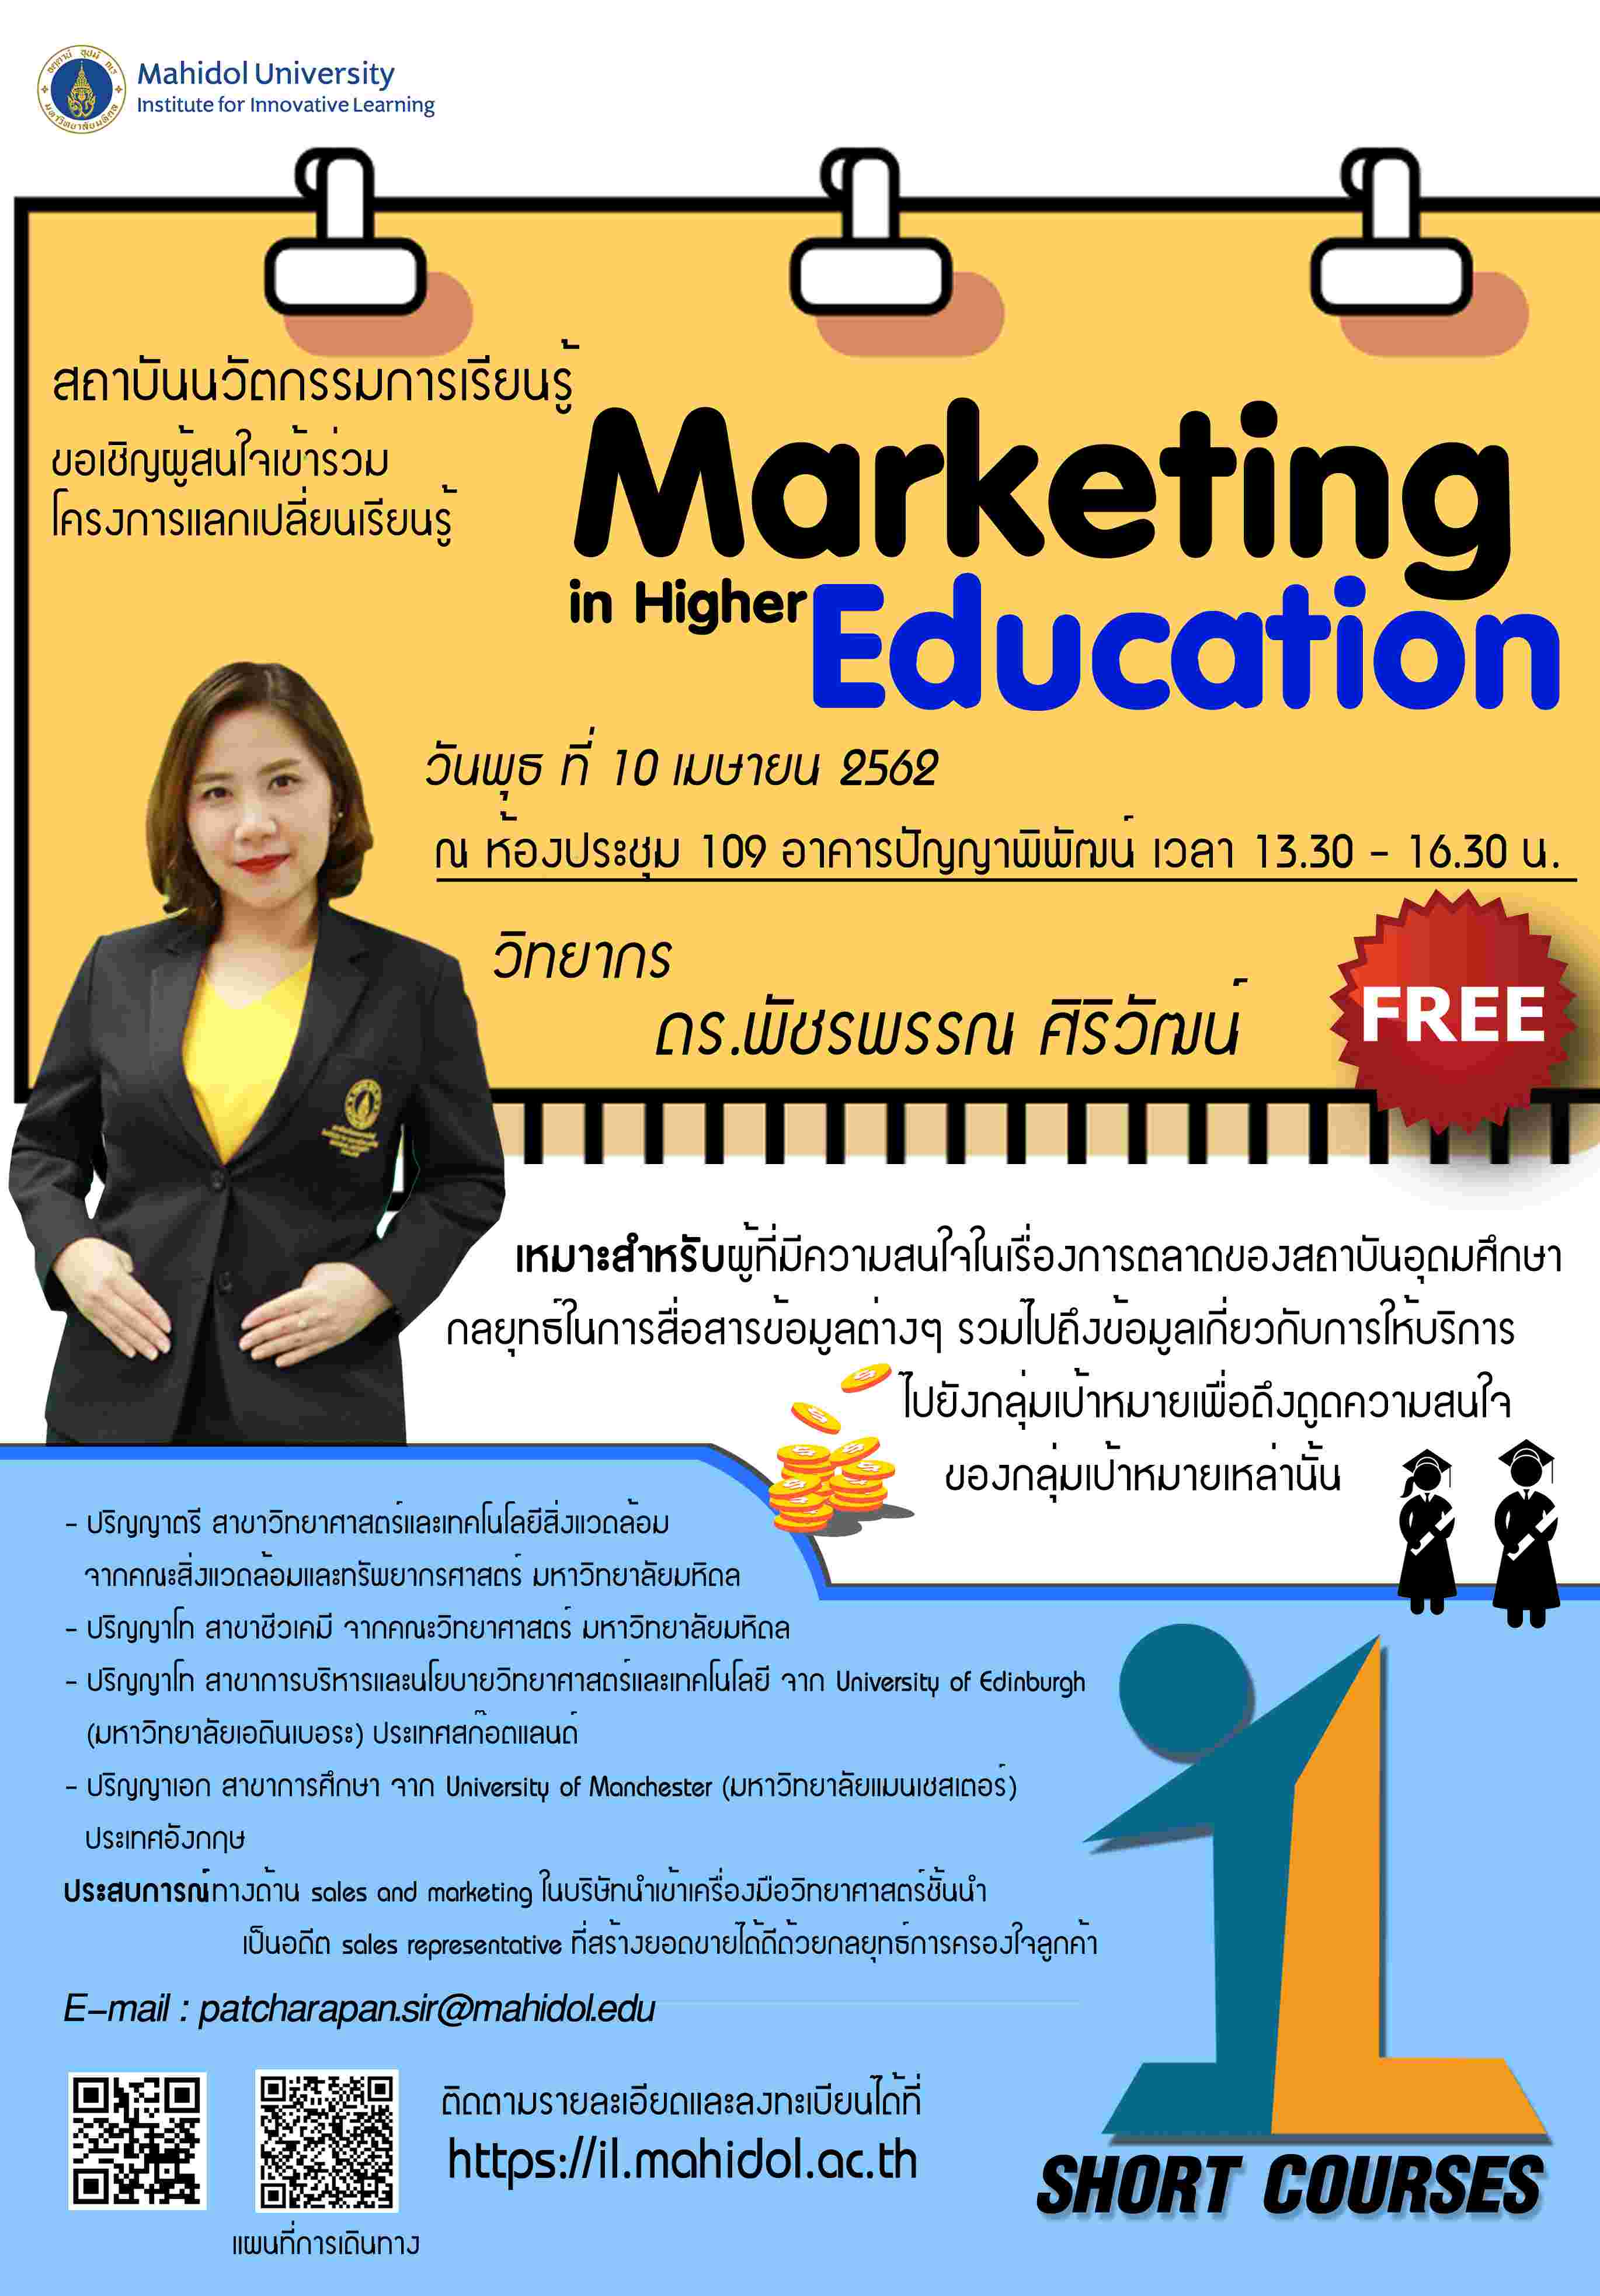 Marketing in Higher Education @ อาคารปัญญาพิพัฒน์